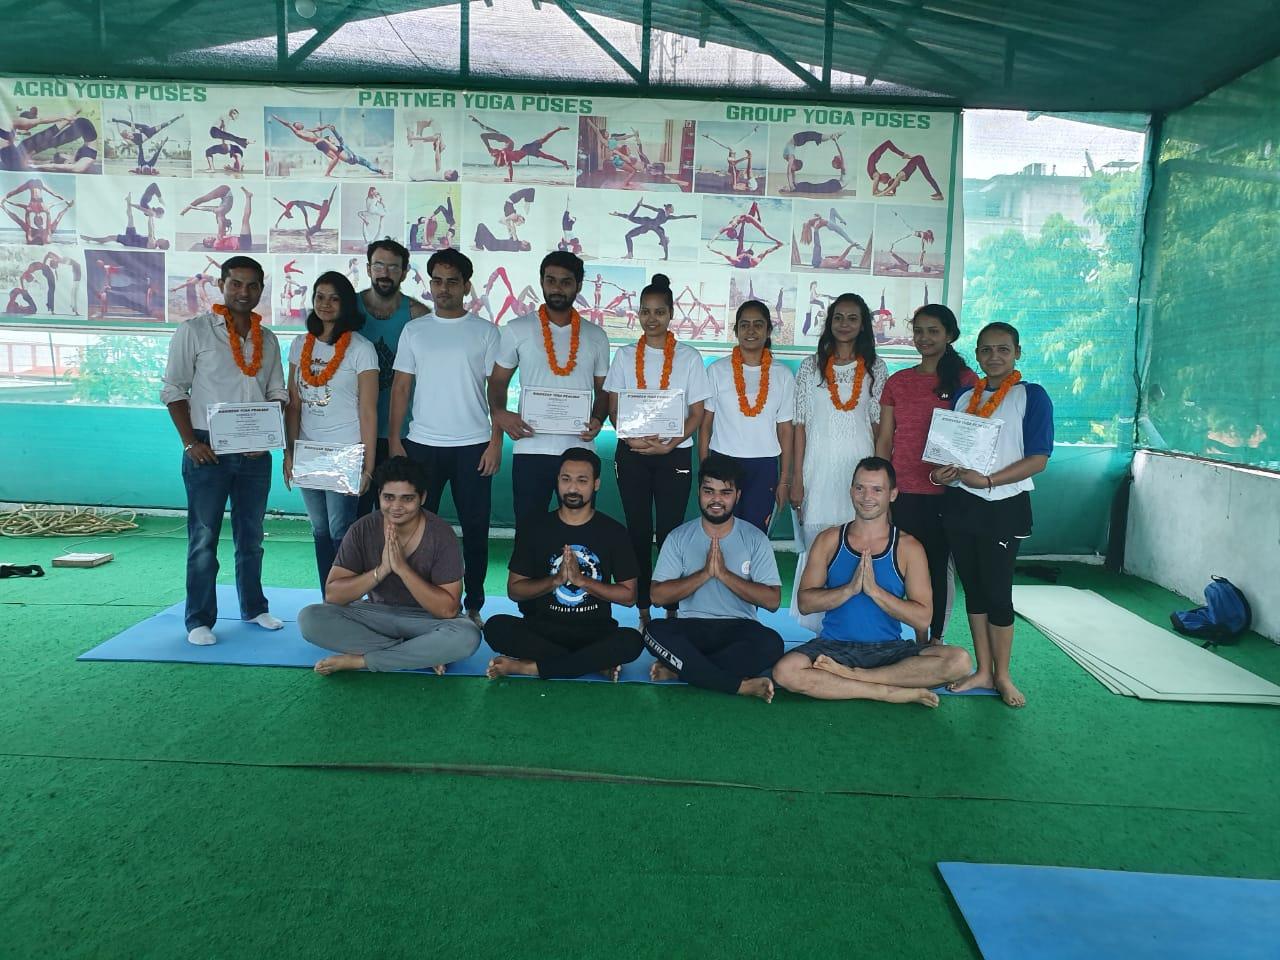 Kunwar-Yoga-Students-1k